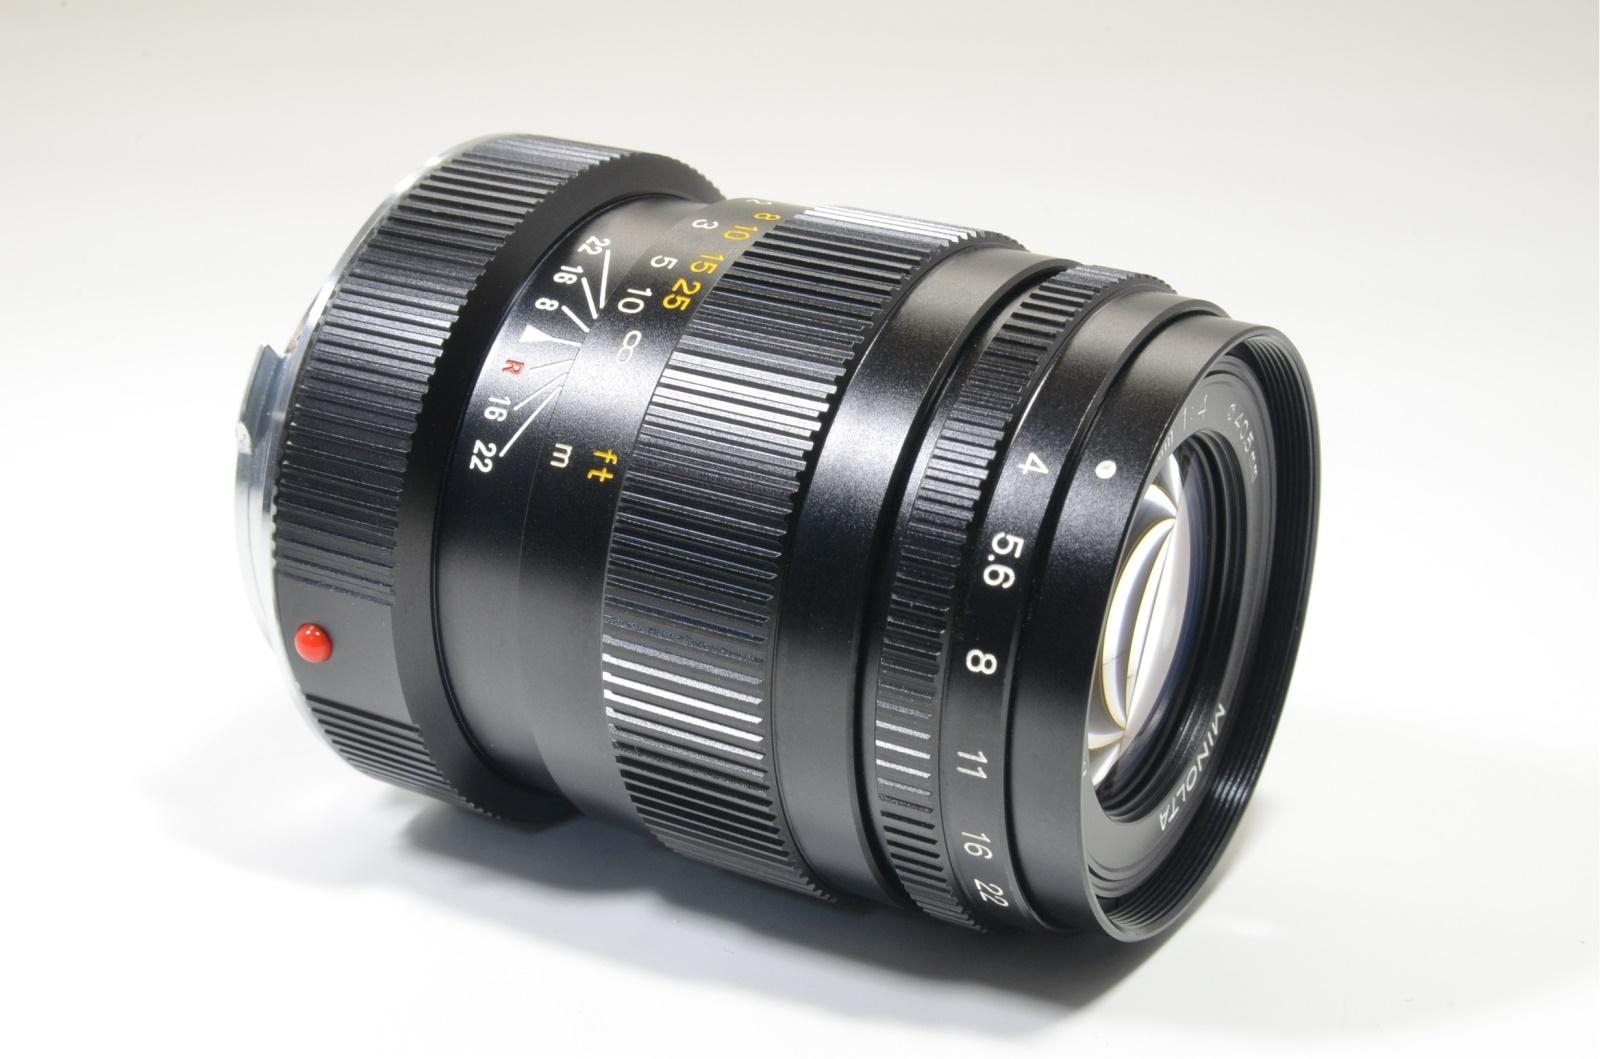 minolta m-rokkor 90mm f4 m-mount lens from japan